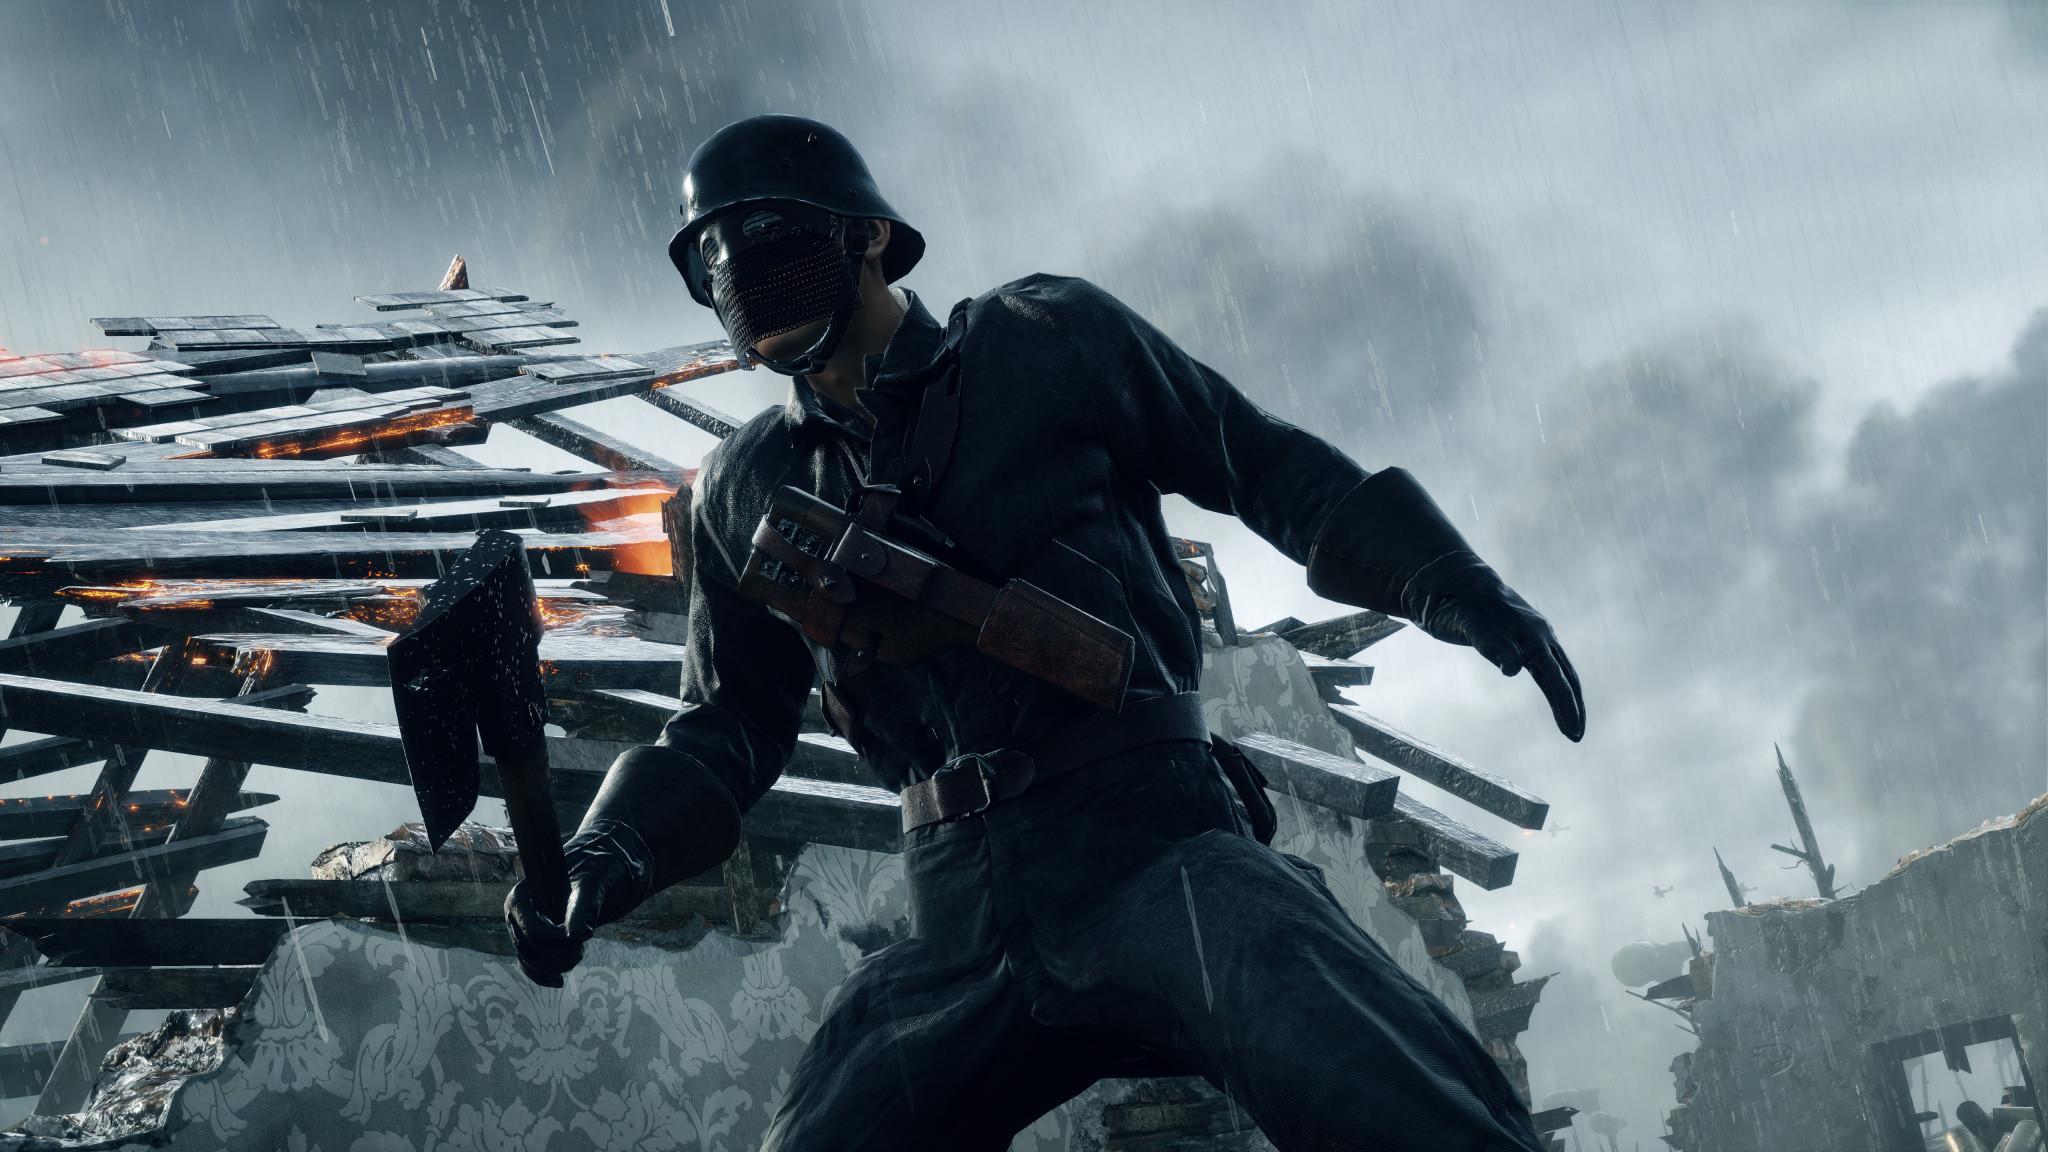 Res: 2048x1152,  wallpaper Battlefield 1 gaming